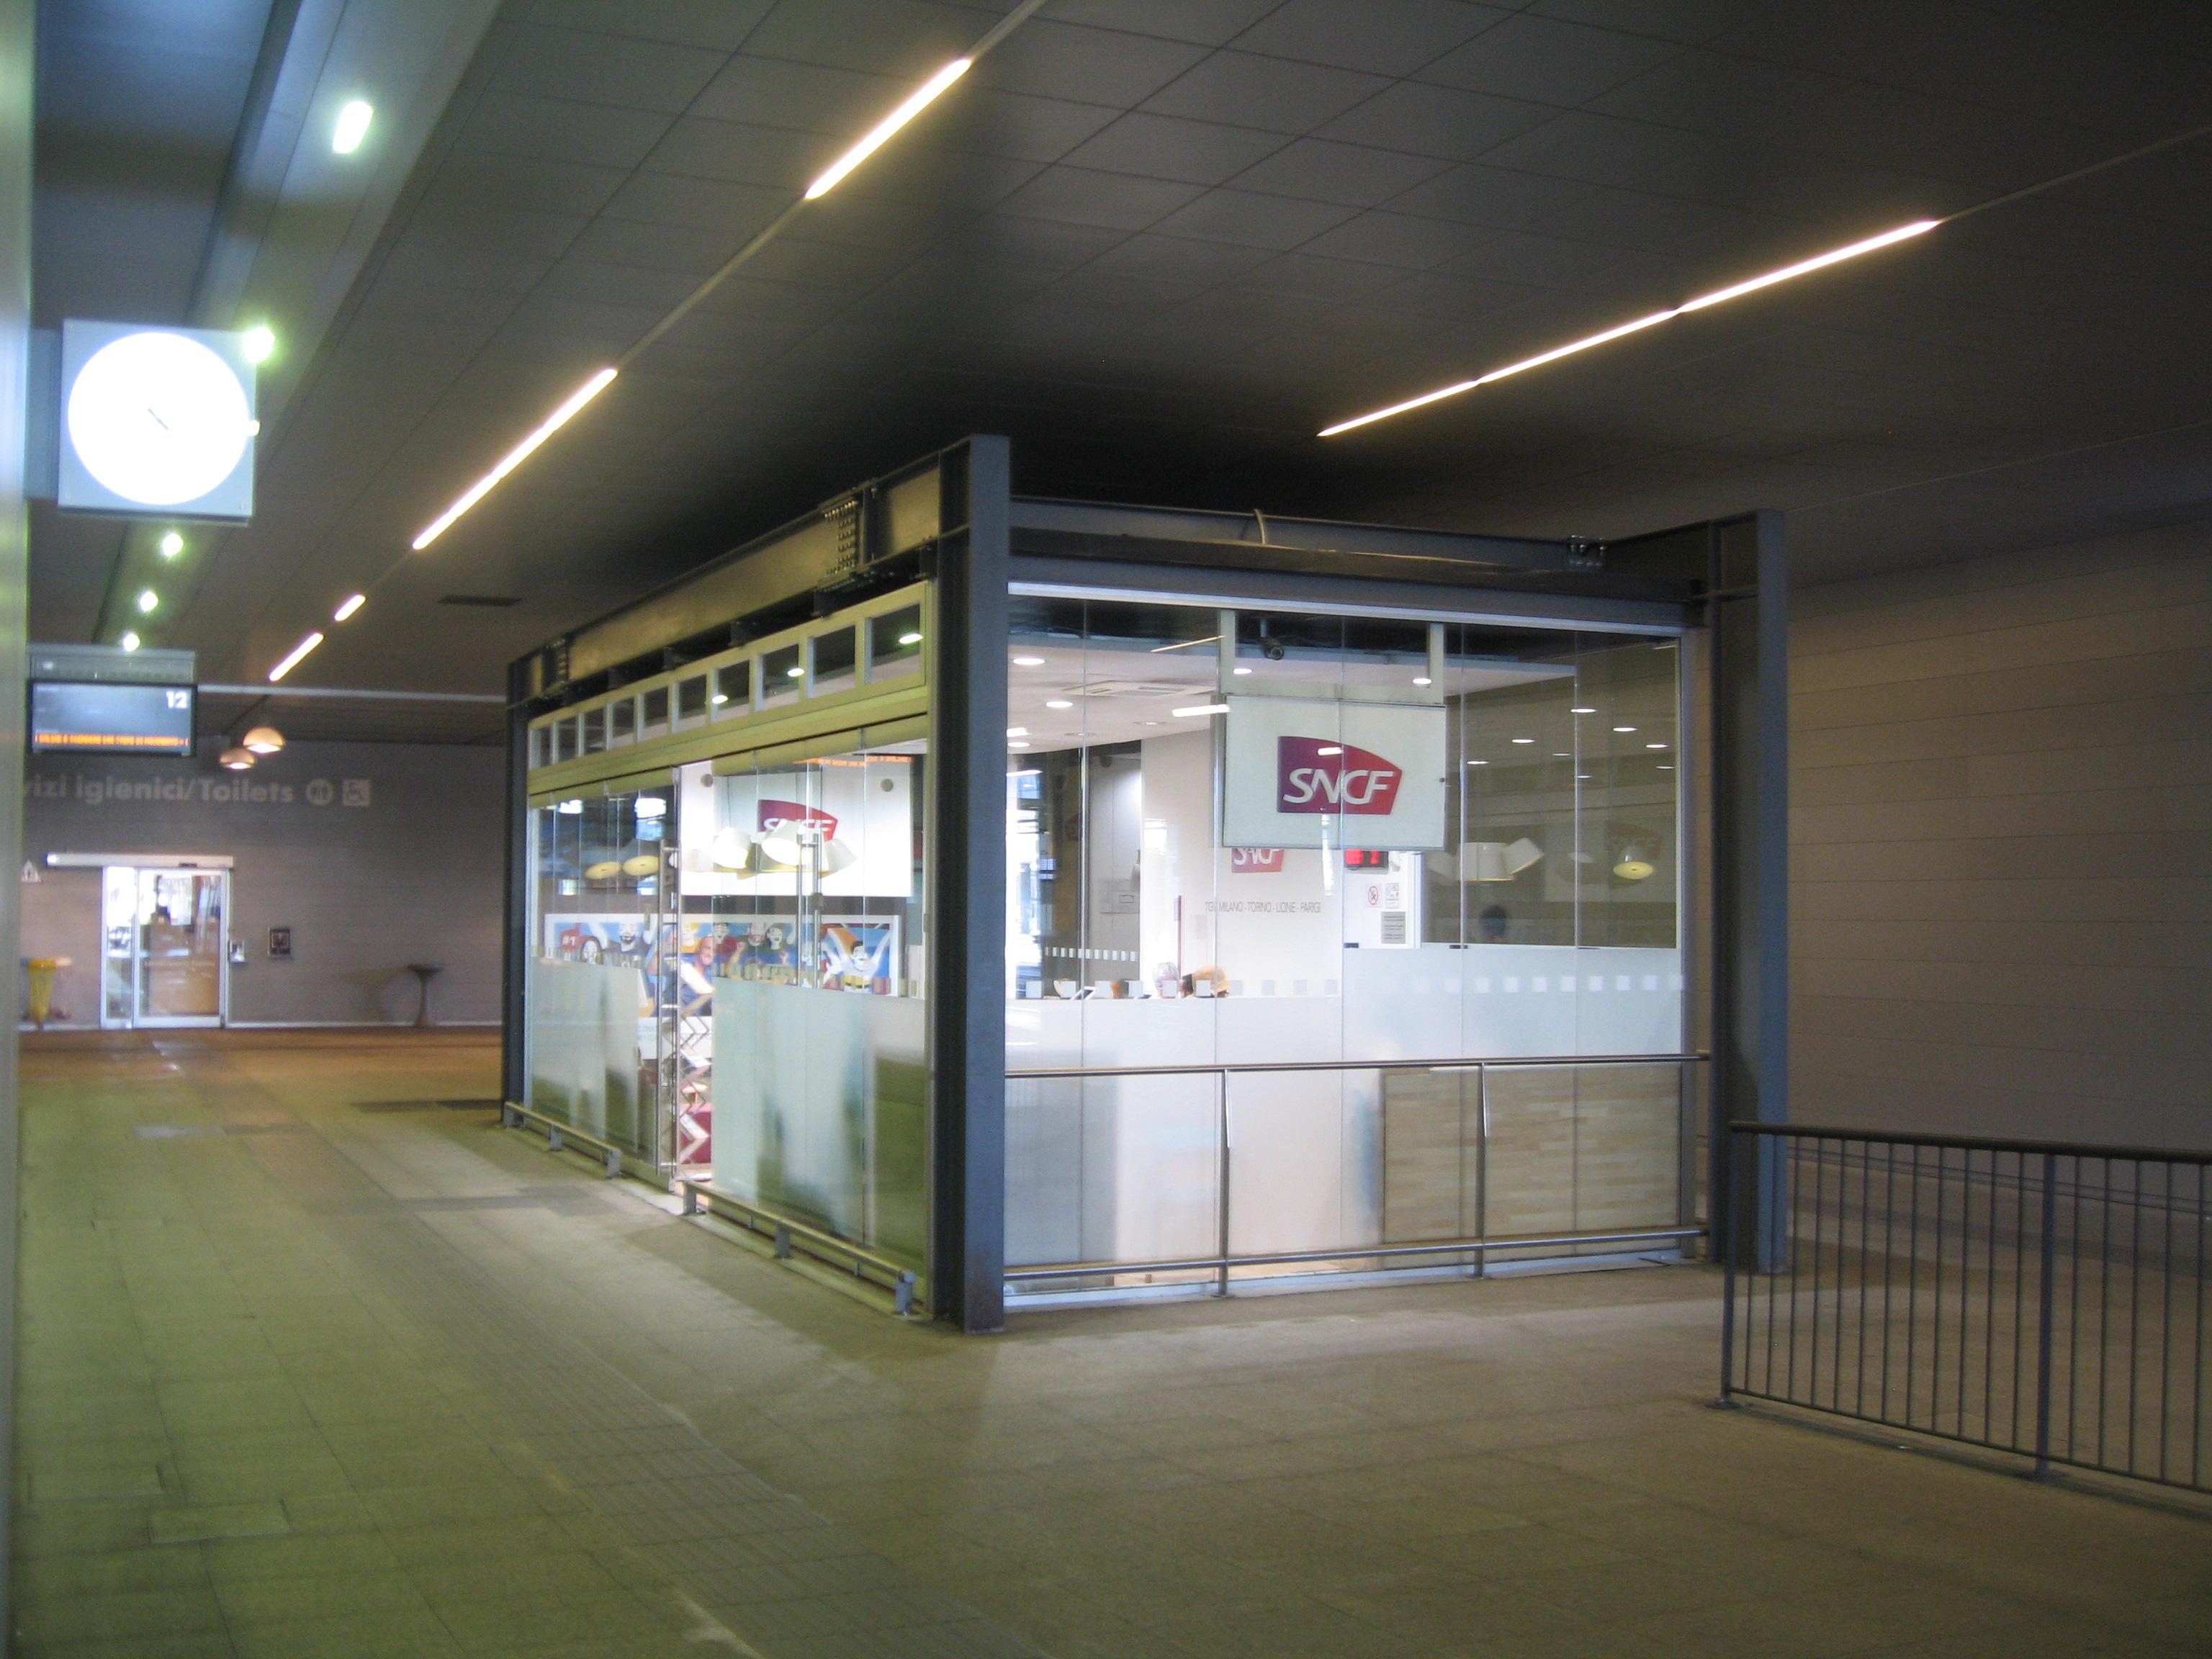 29 Milano Porta Garribaldi Schalter SNCF